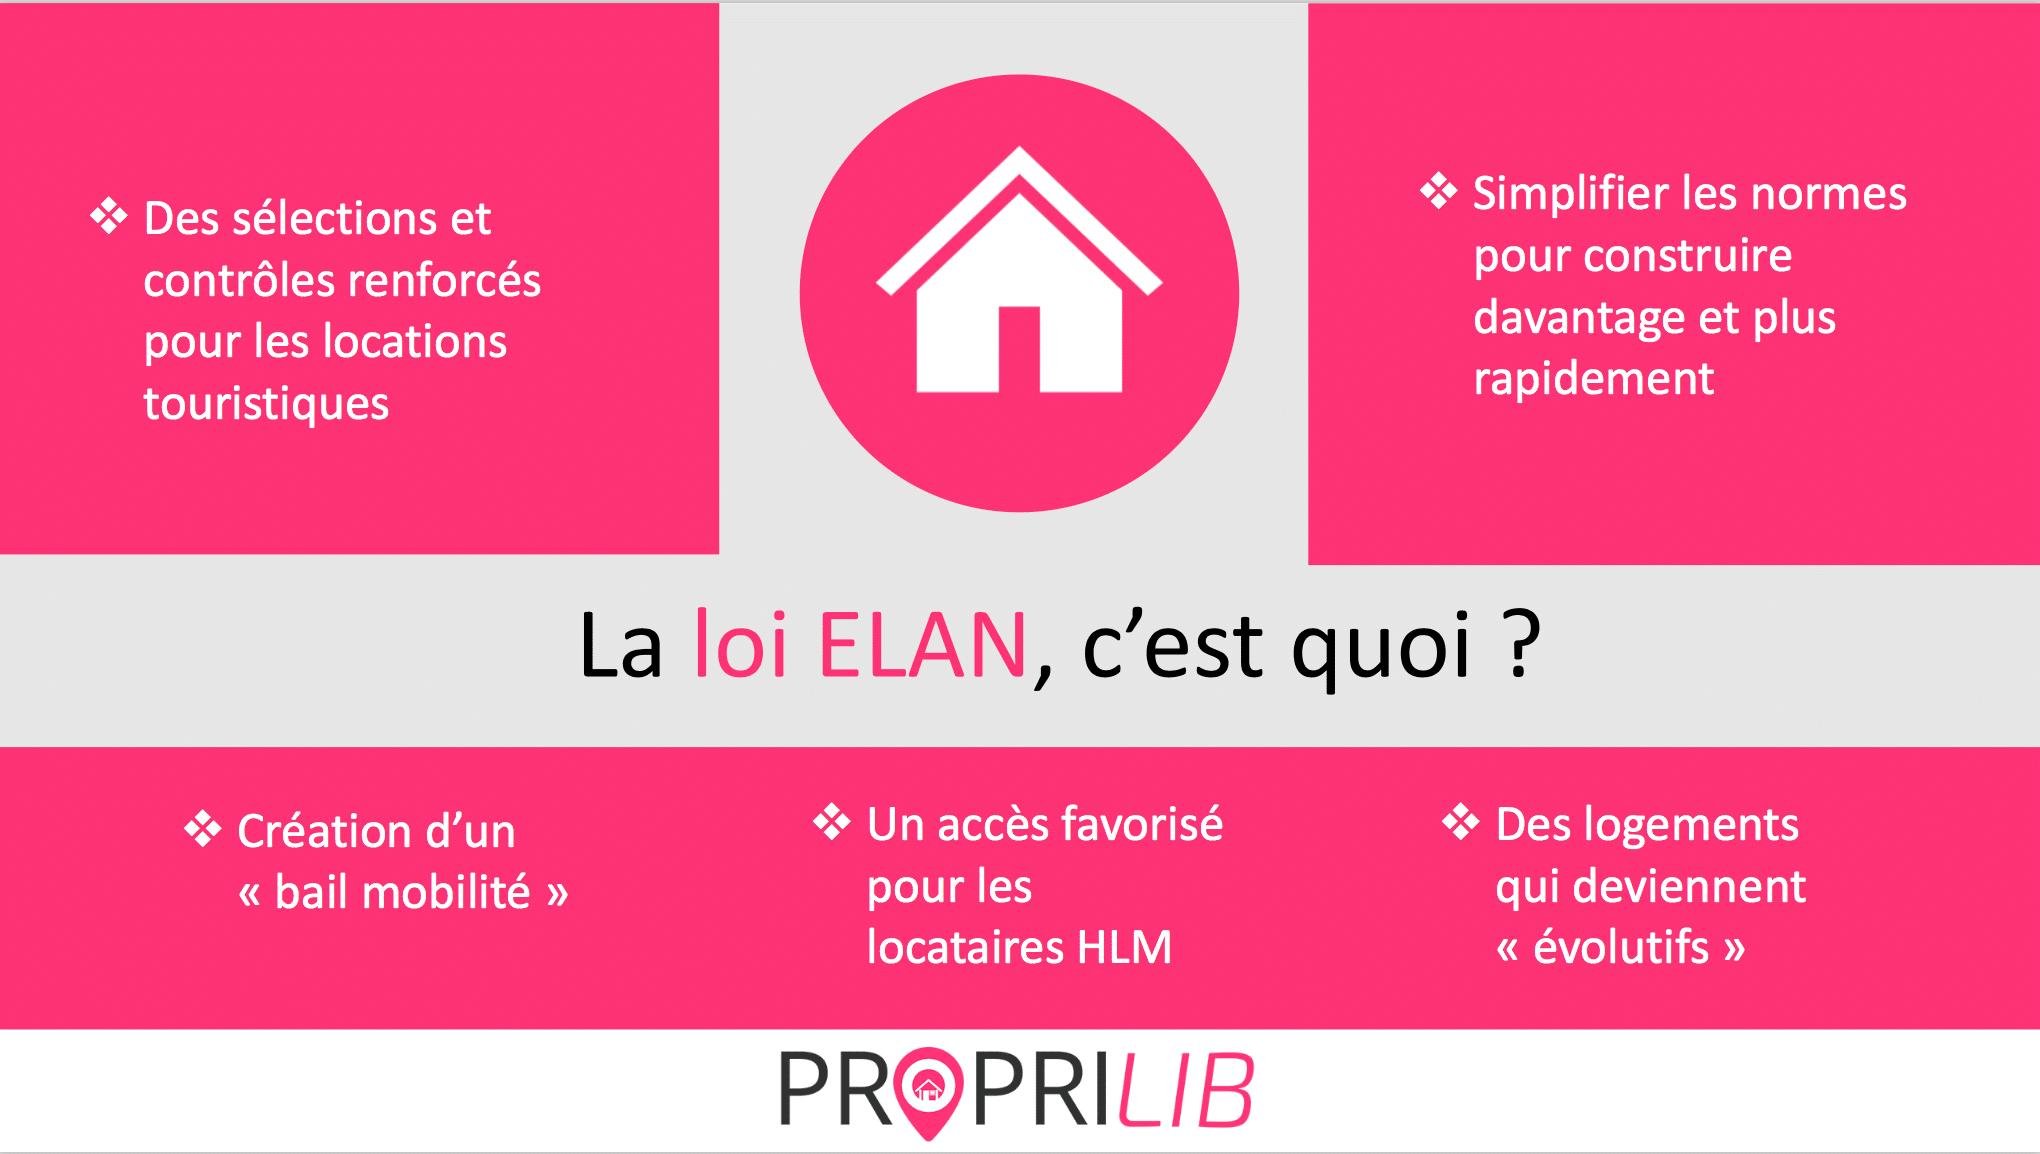 Les impacts de la loi ELAN sur les logements en France